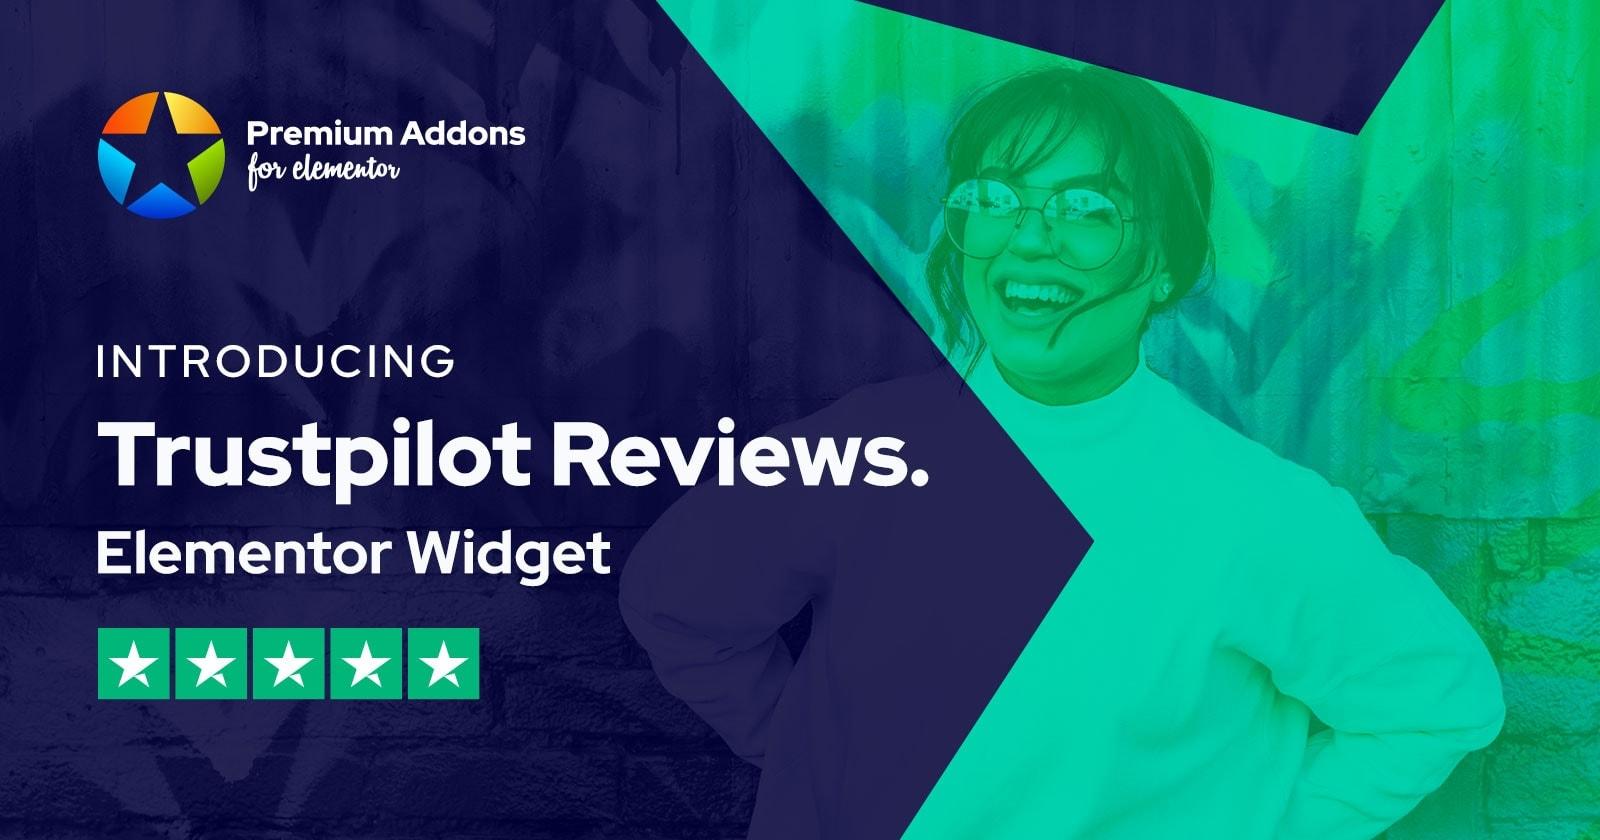 New Trustpilot Reviews Elementor Widget Added to Premium Addons PRO Bundle